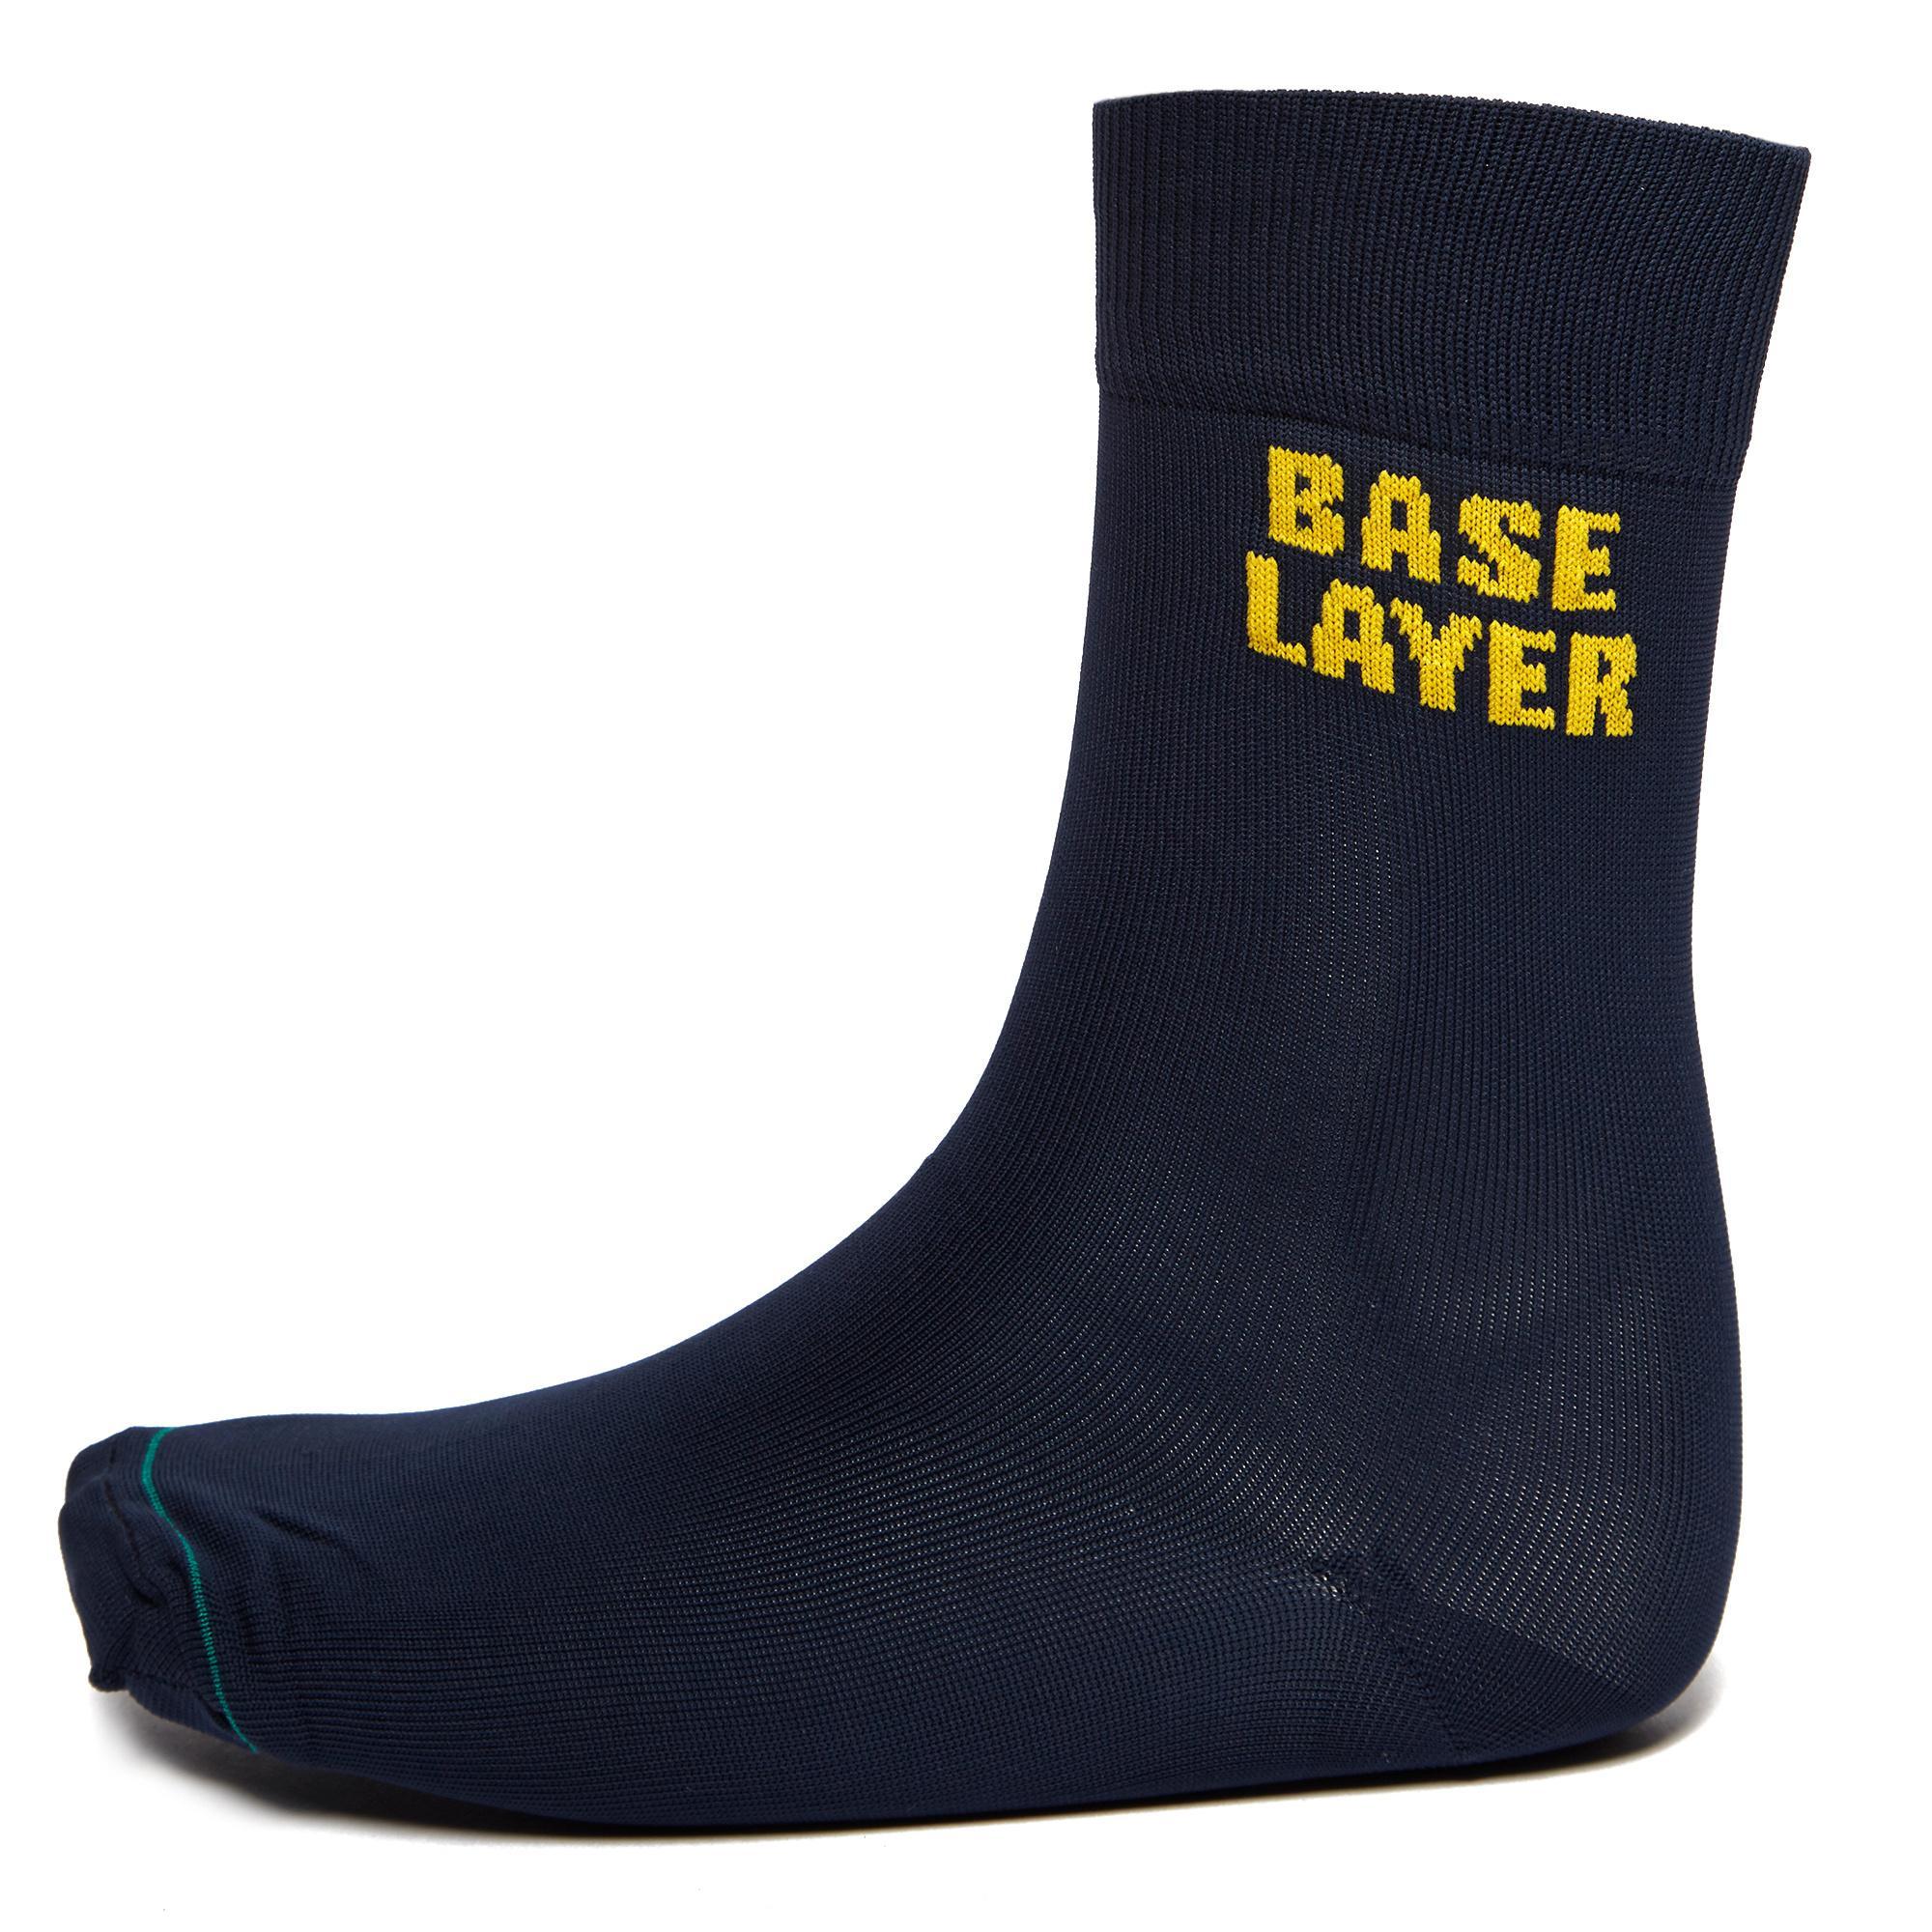 Image of 1000 Mile Tactel Baselayer Sock, Navy